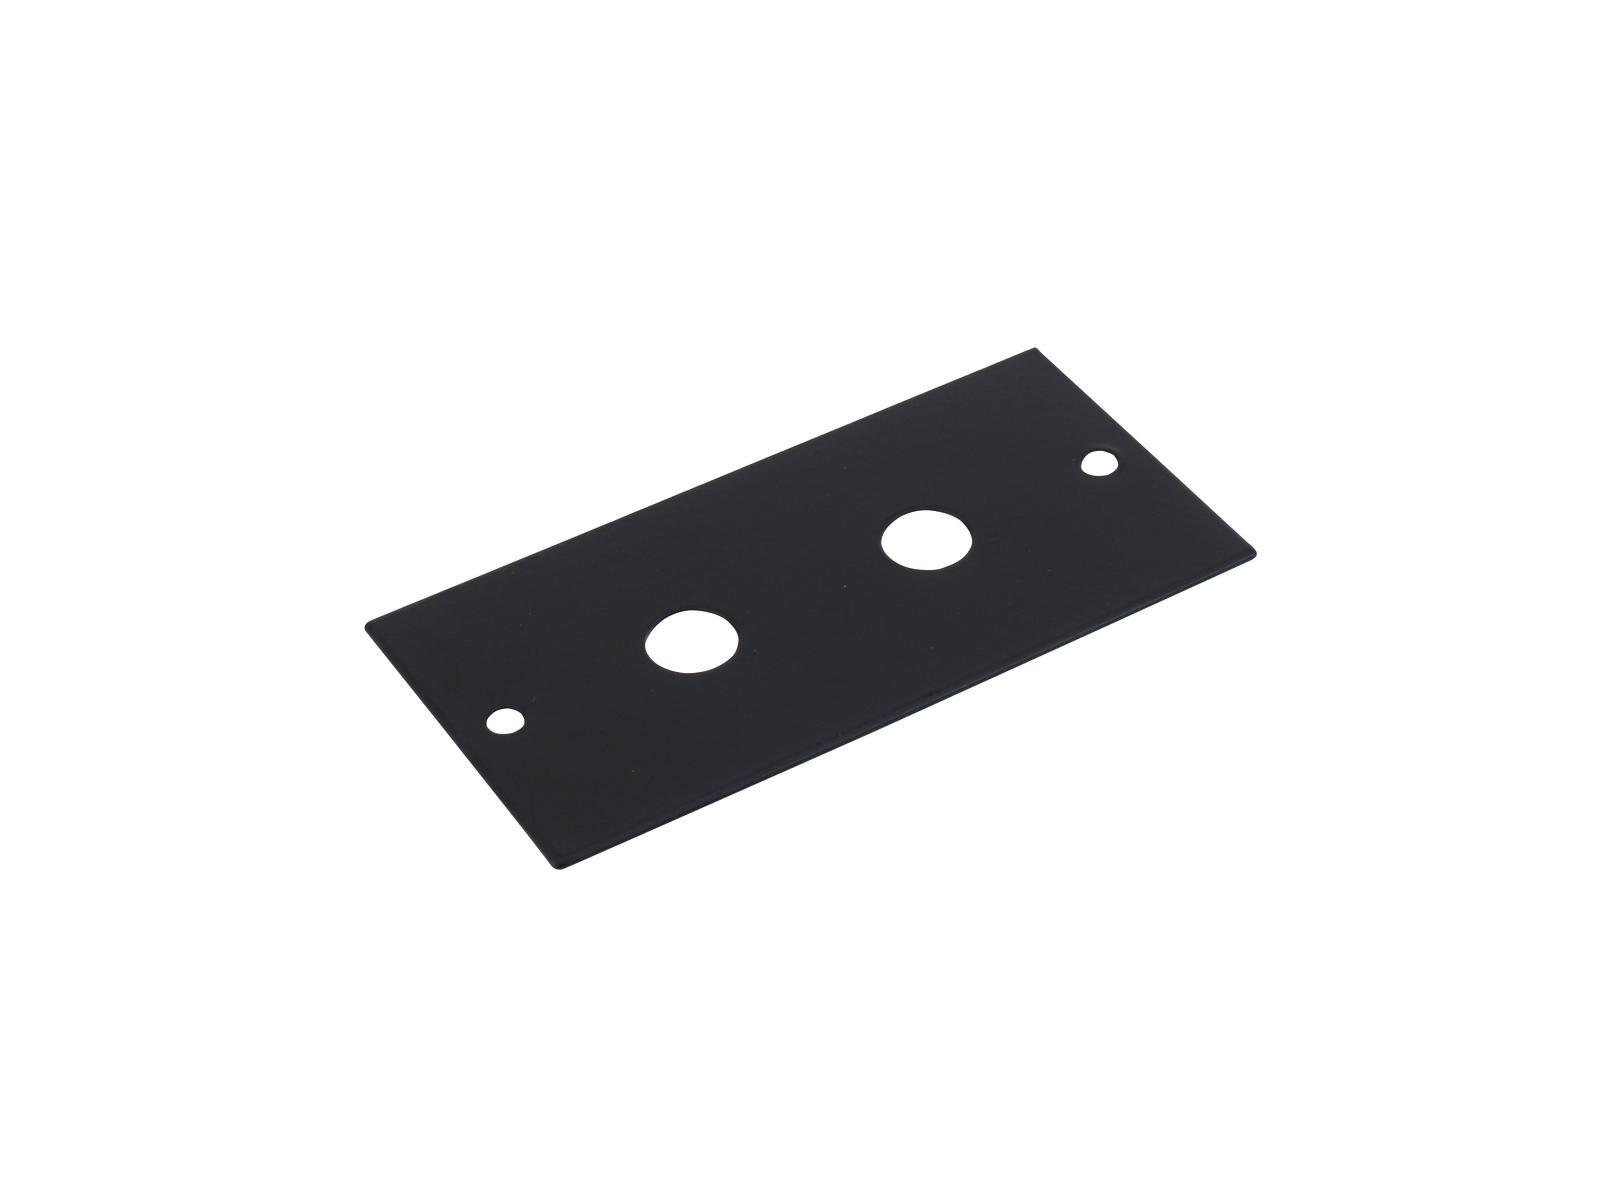 OMNITRONIC Modul 2HE 2x Klinkenstecker 44x88mm